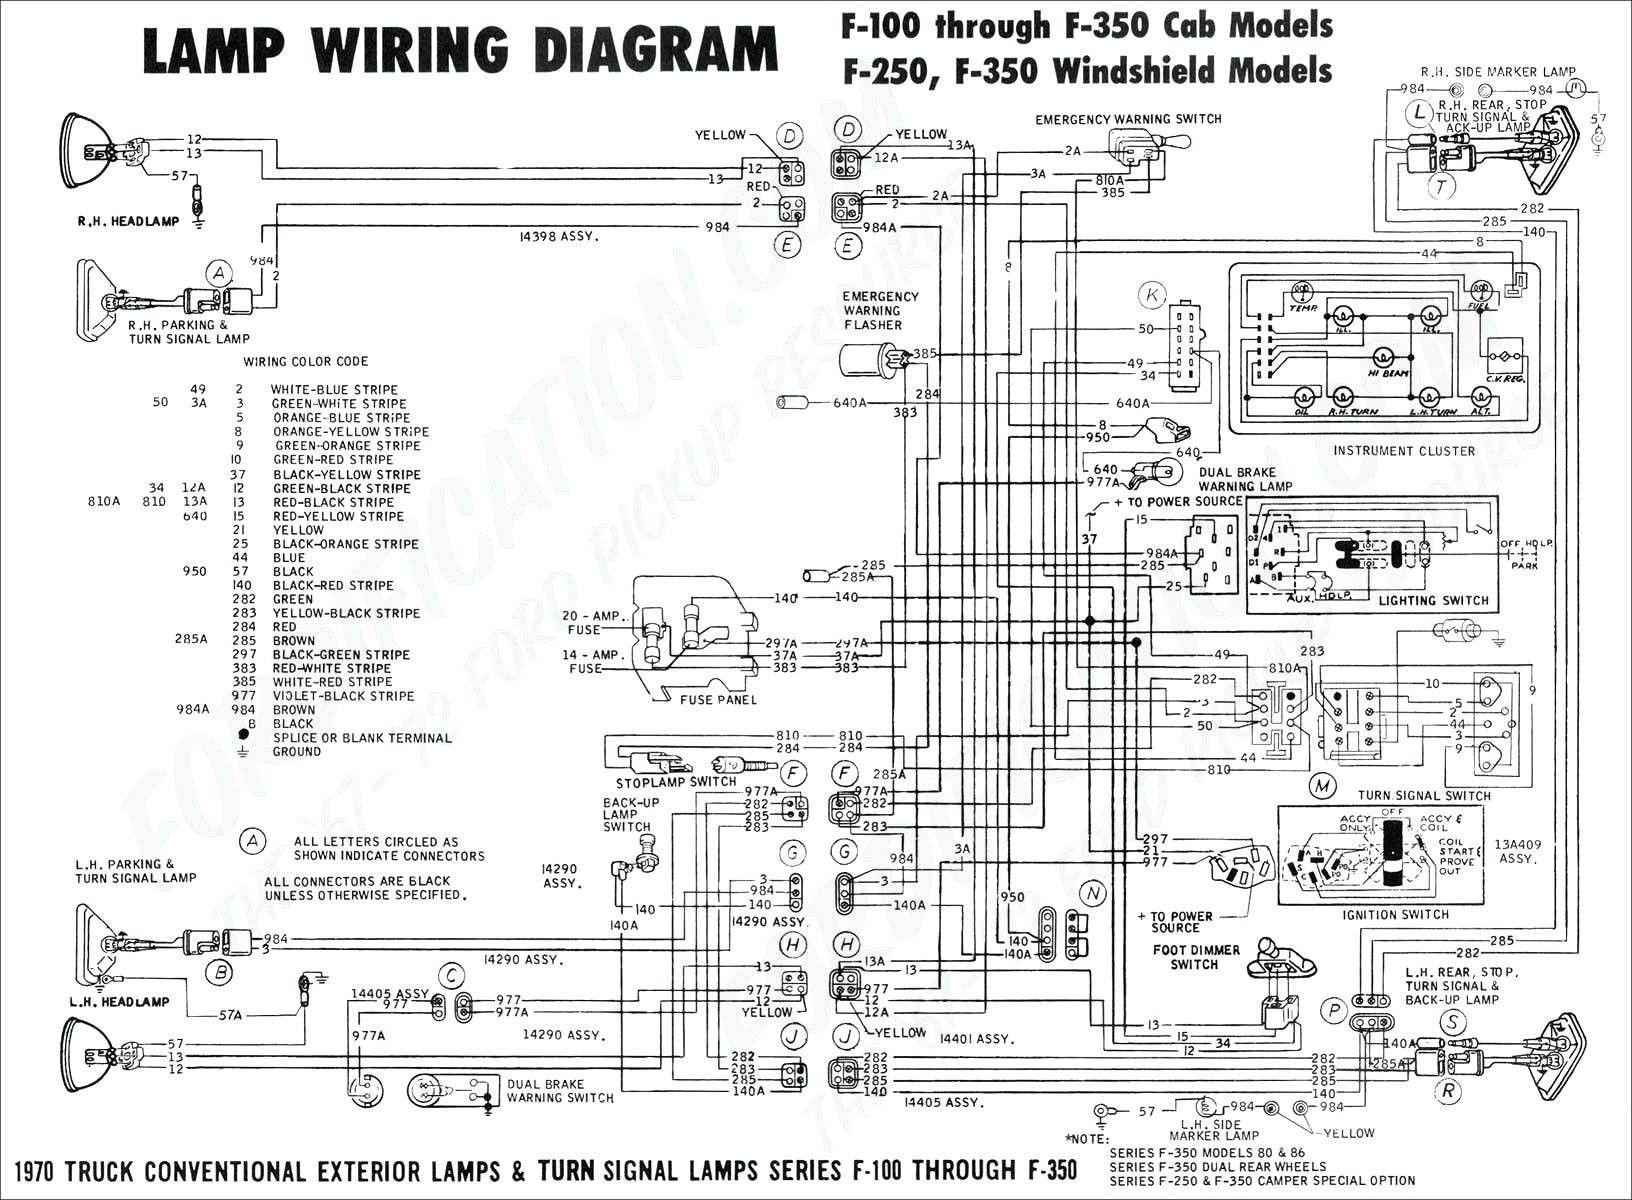 2005 Ford Explorer 4 0 Engine Diagram Di 2020 Ford Explorer Nissan Maxima Stratus